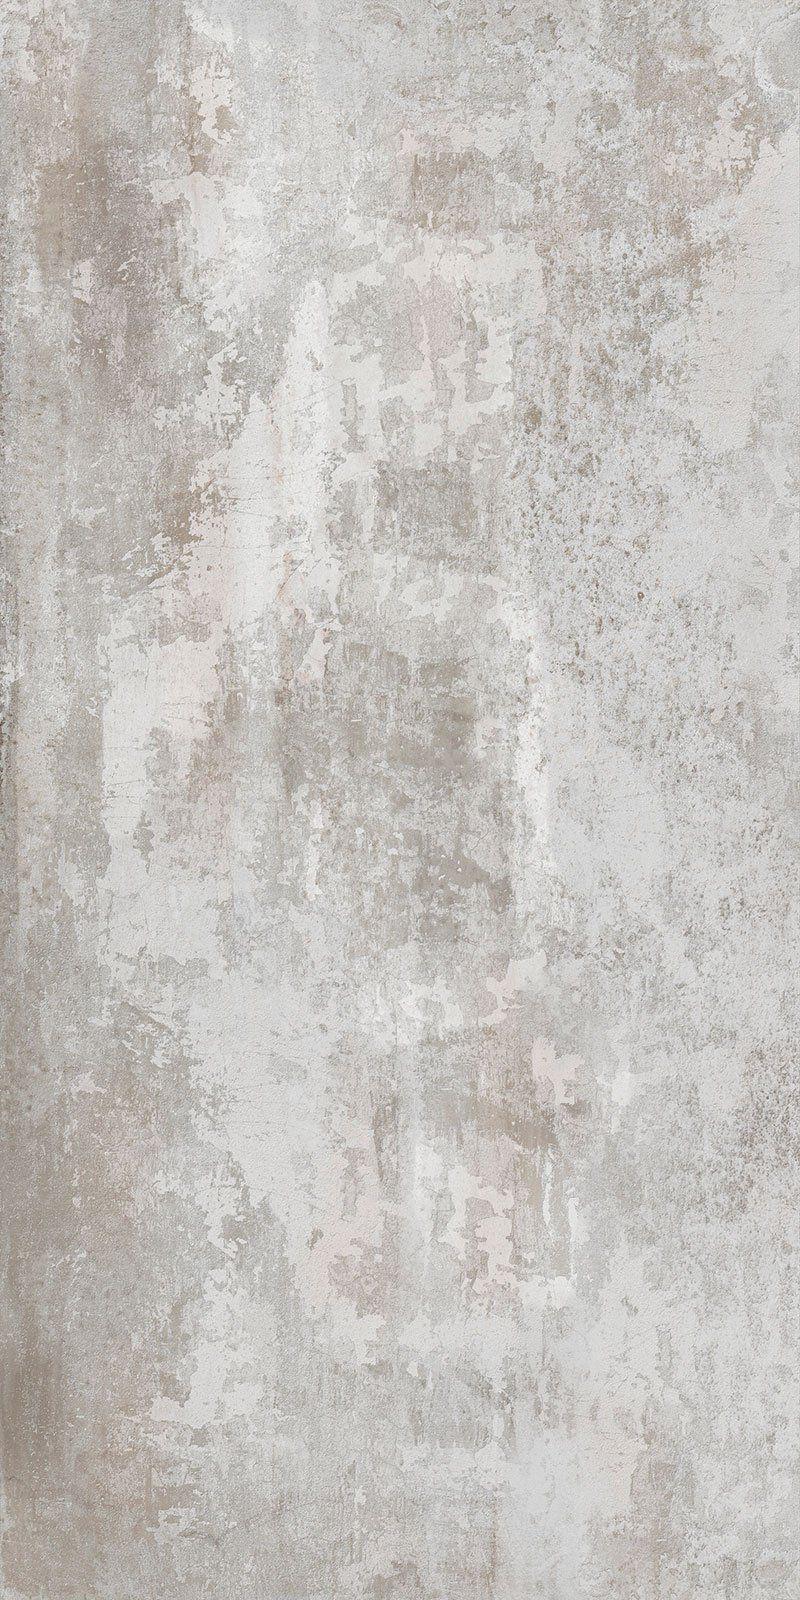 Privilege Colored Porcelain Wall Tiles Wall Texture Types Concrete Texture Tiles Texture